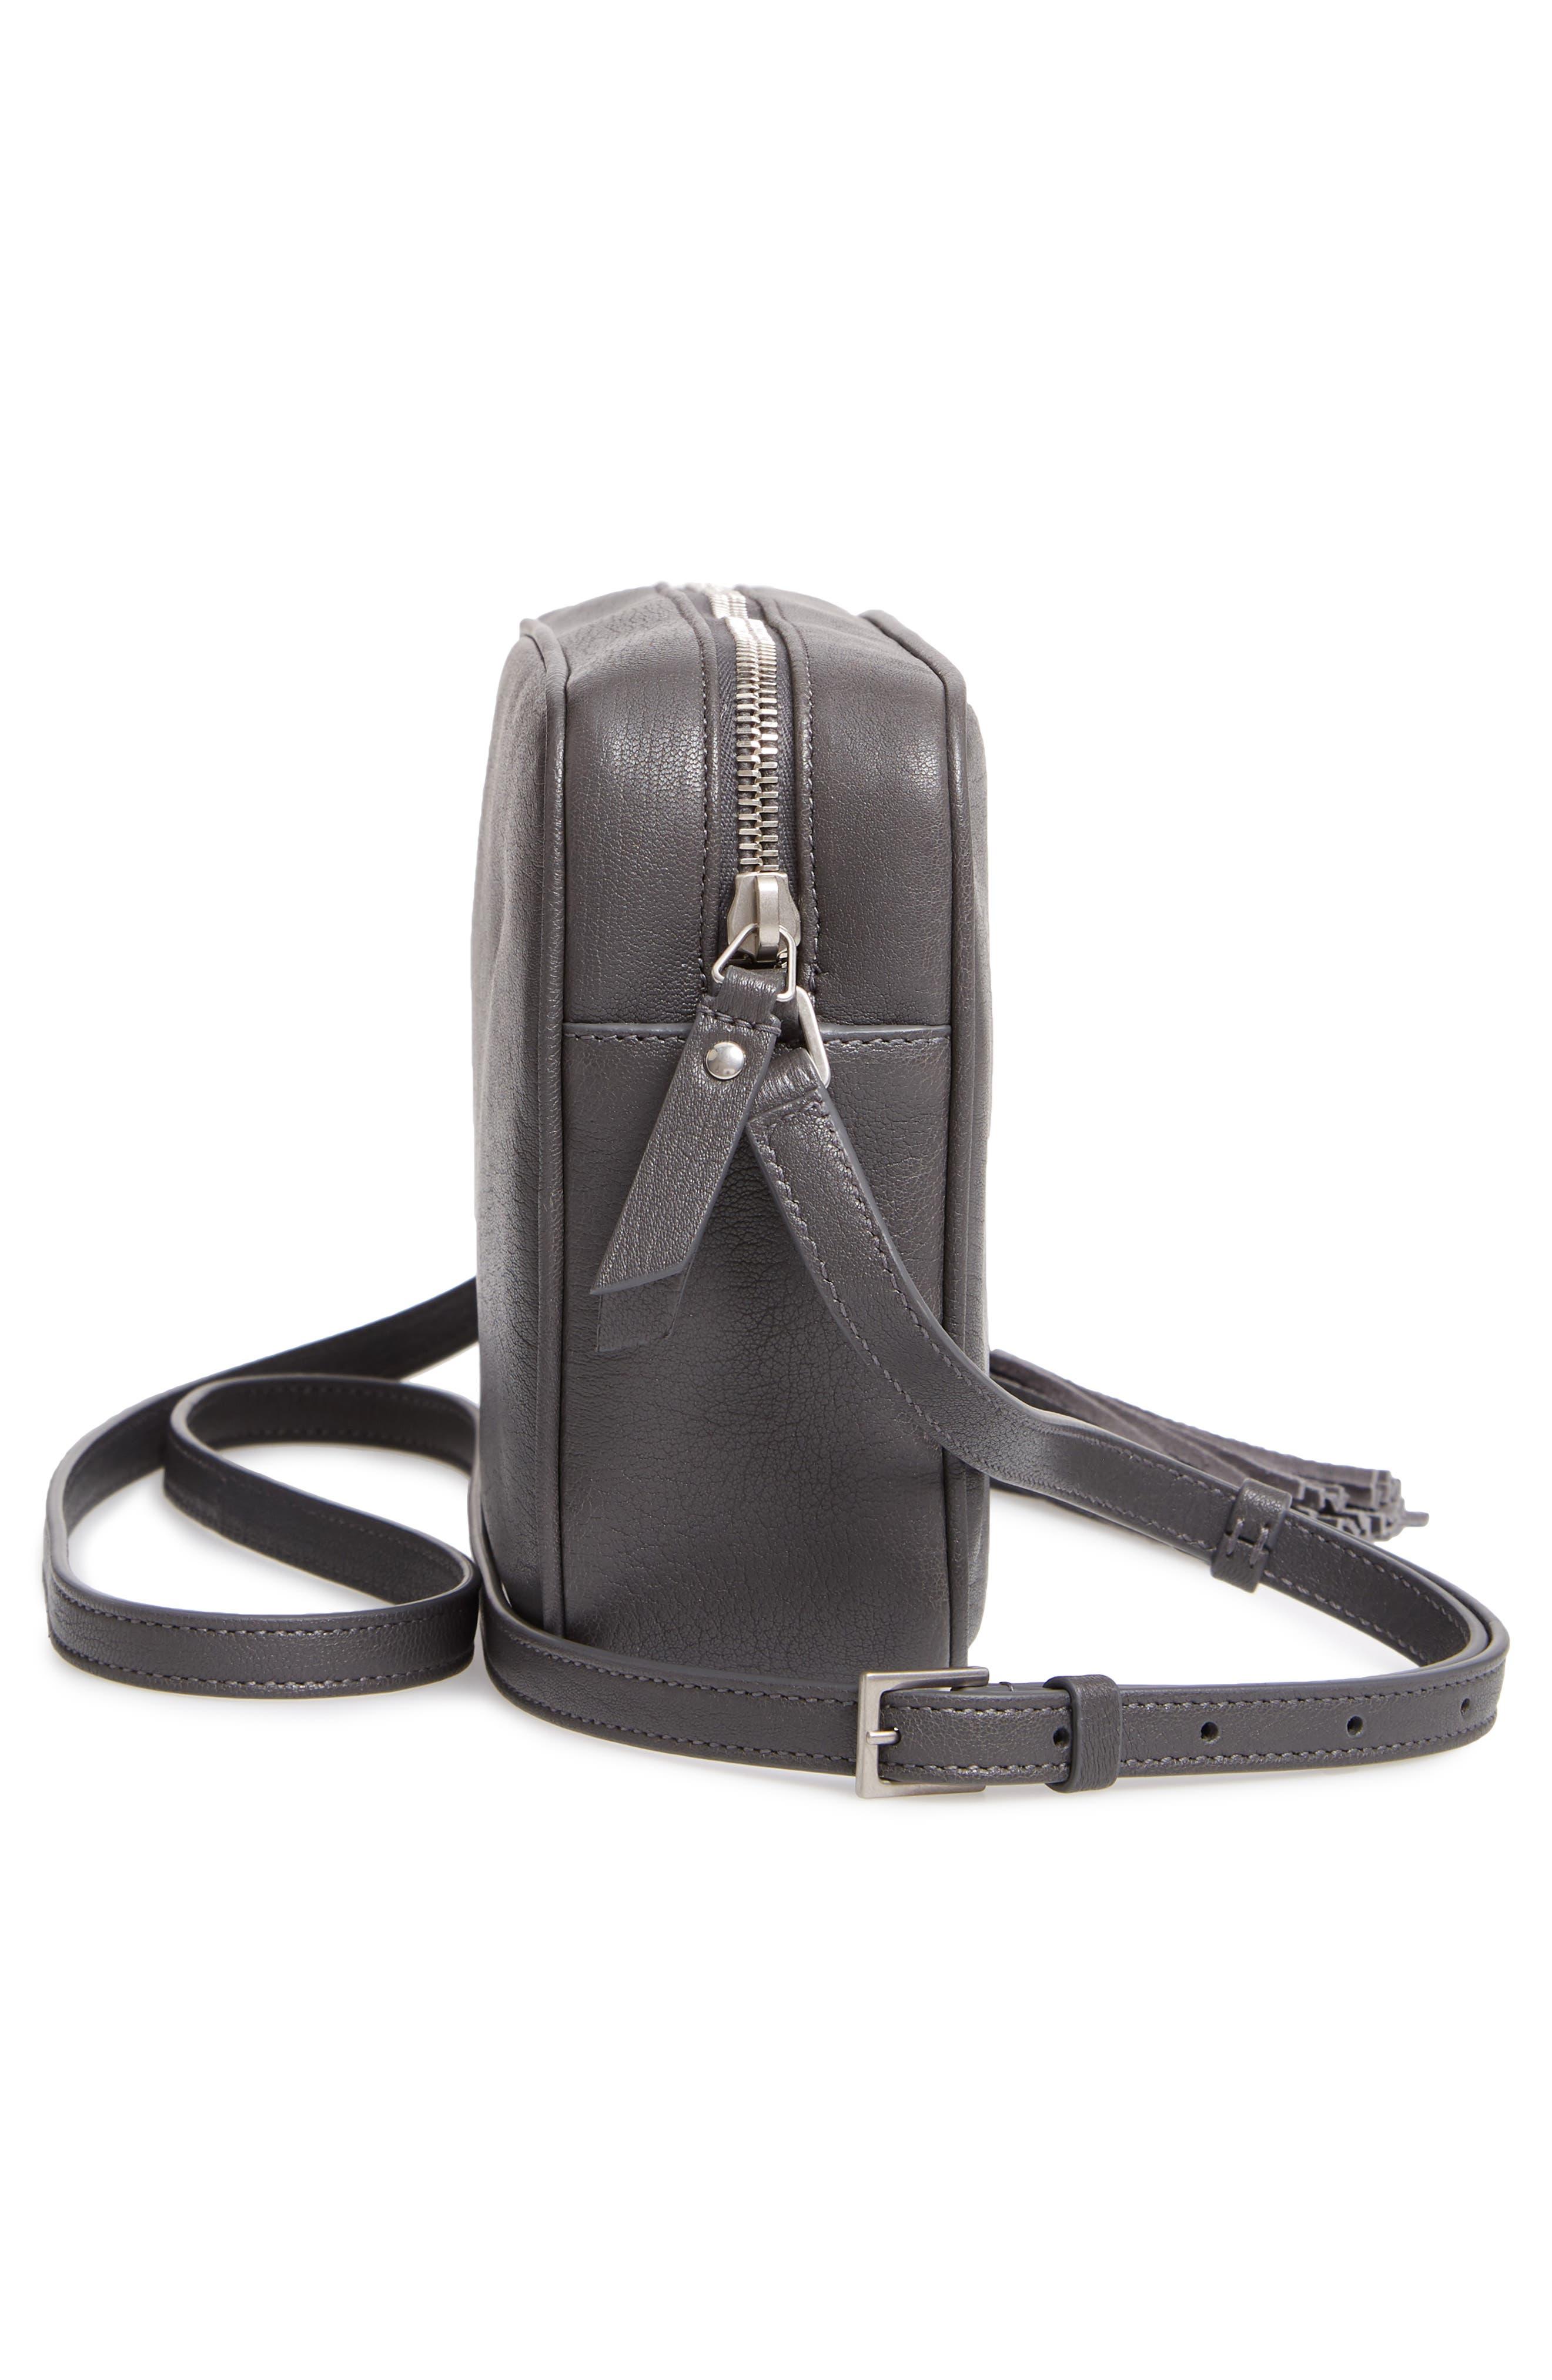 SAINT LAURENT, Small Mono Leather Camera Bag, Alternate thumbnail 5, color, STORM